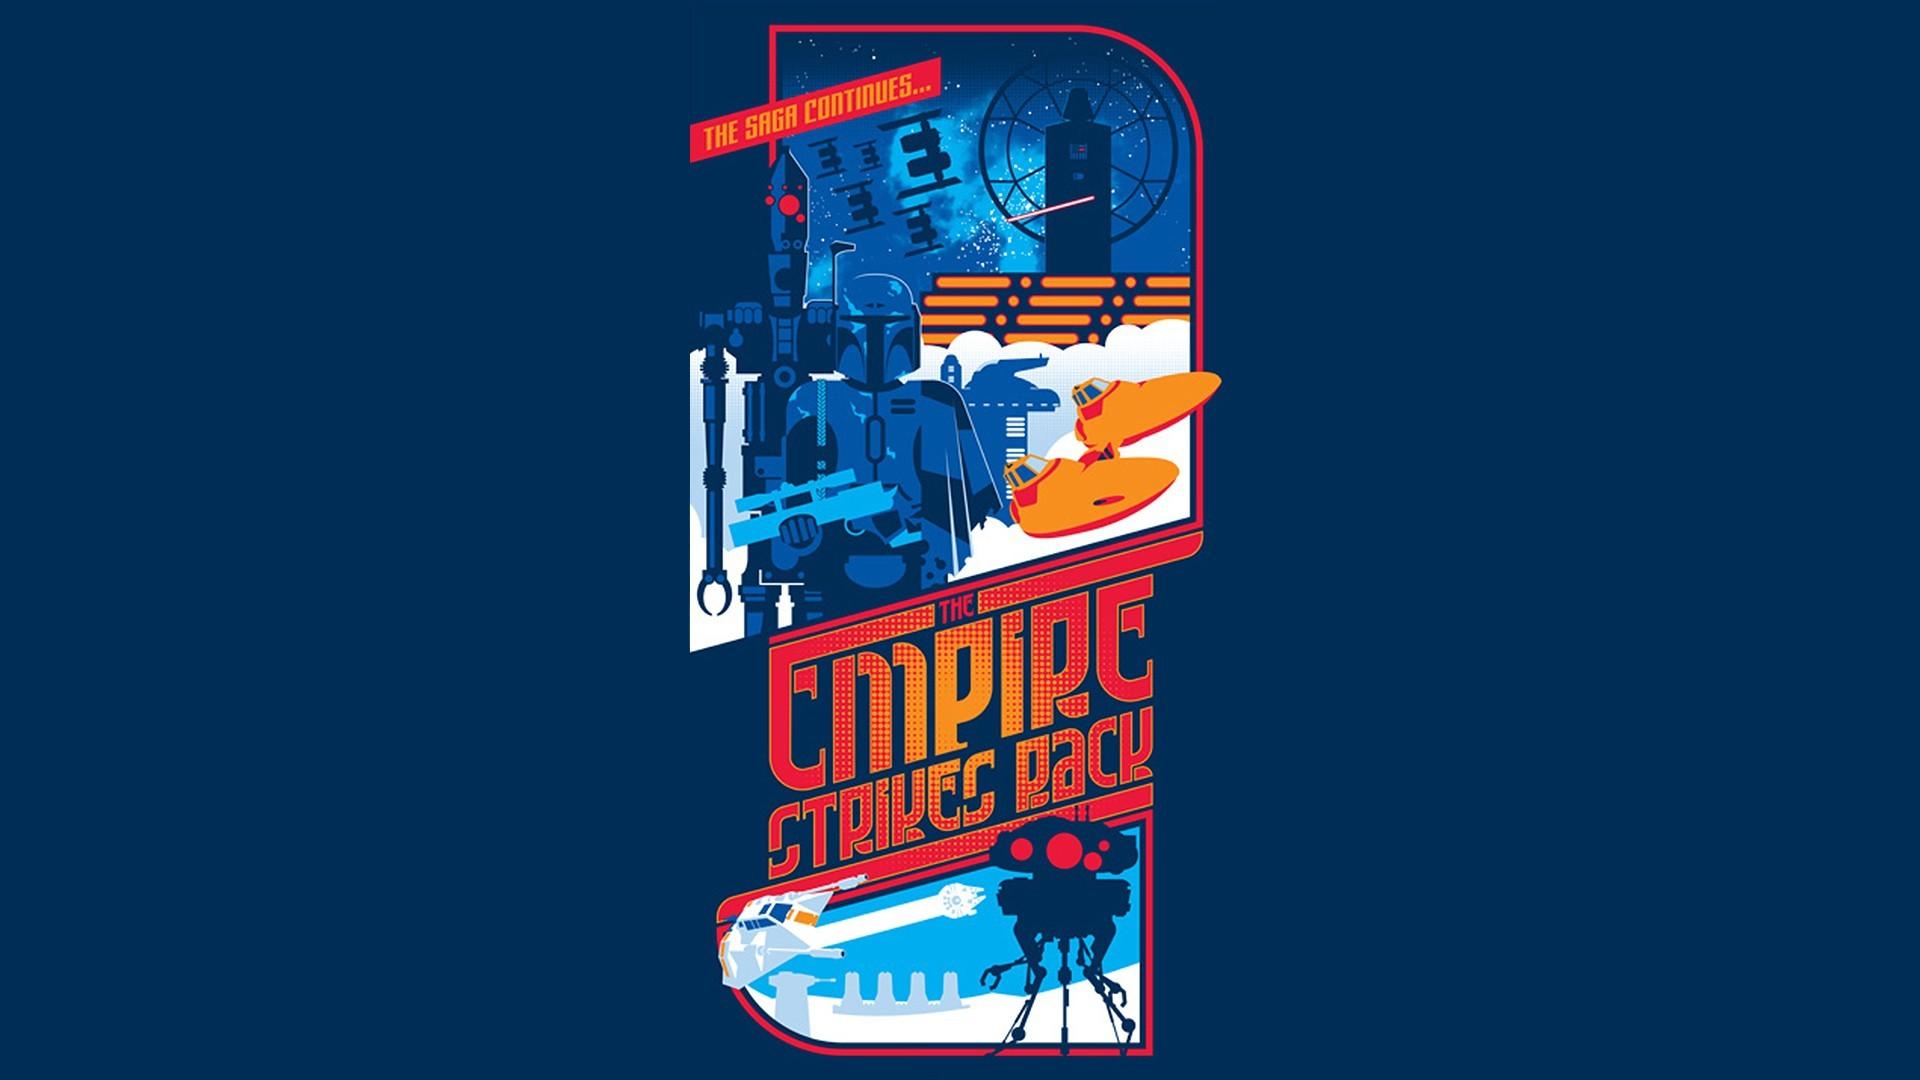 Wallpaper Illustration Star Wars Text Cartoon Graphic Design